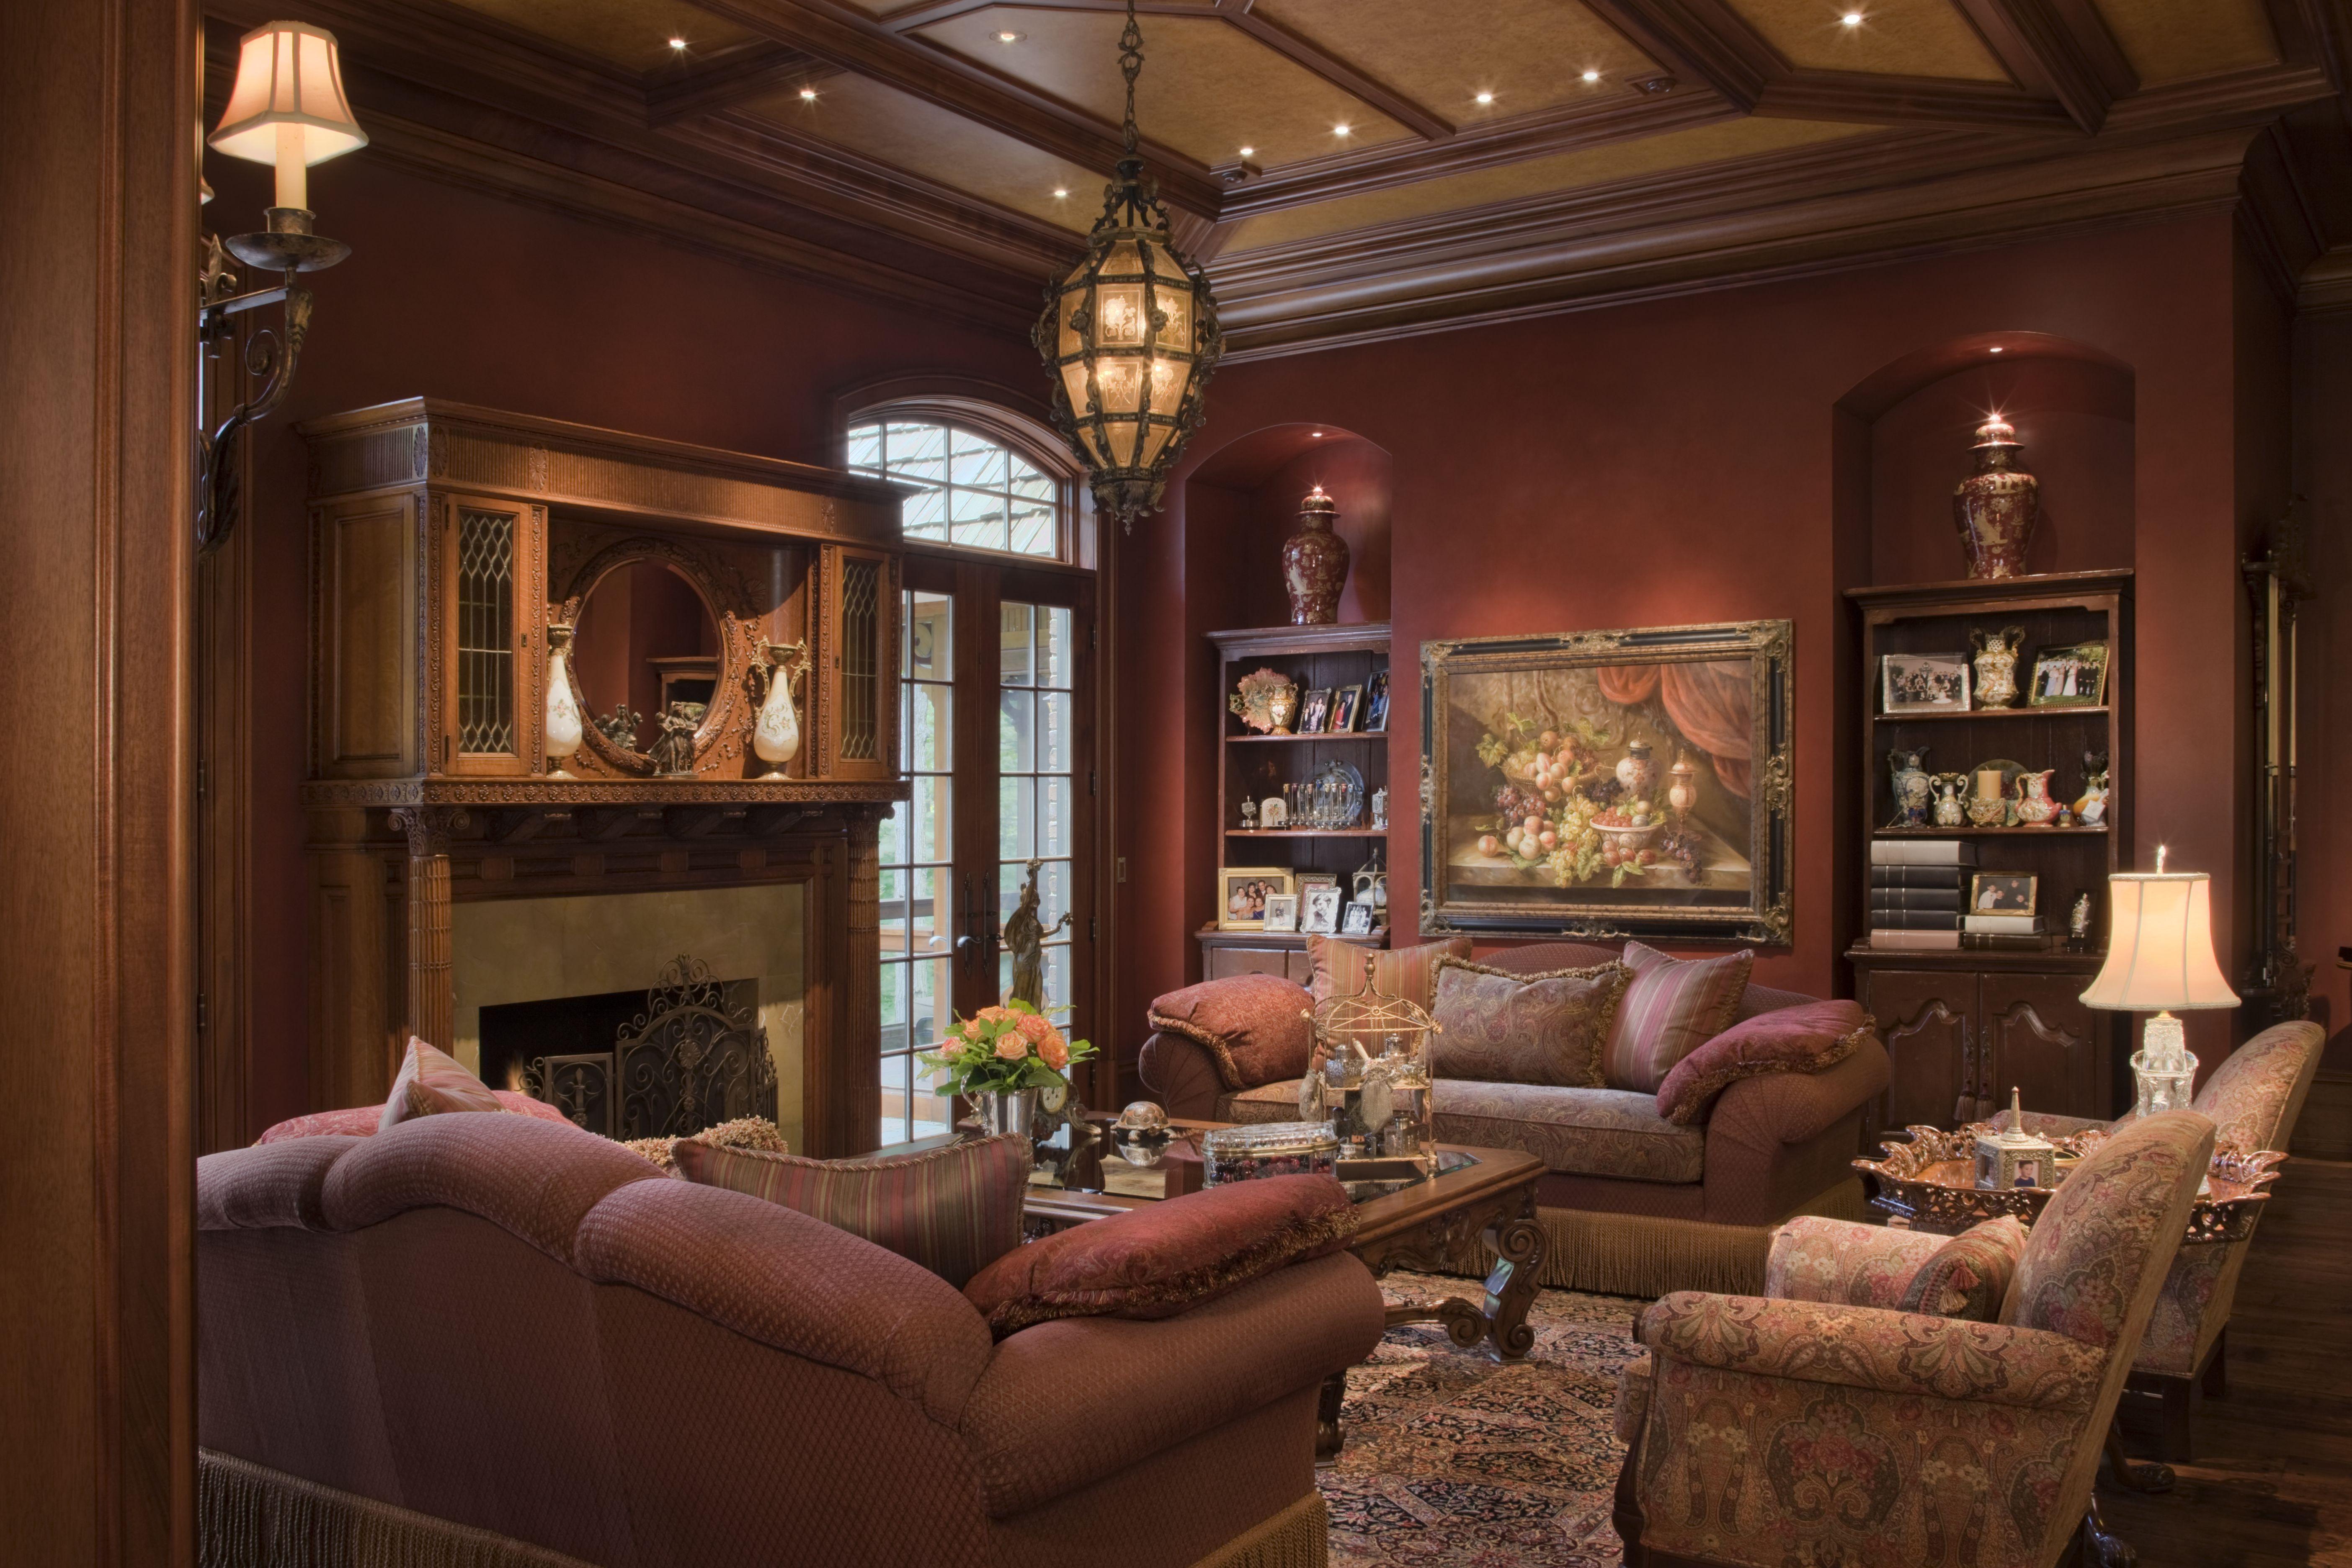 Work Of West Bloomfield Luxury Home Builder Wins 8 Design